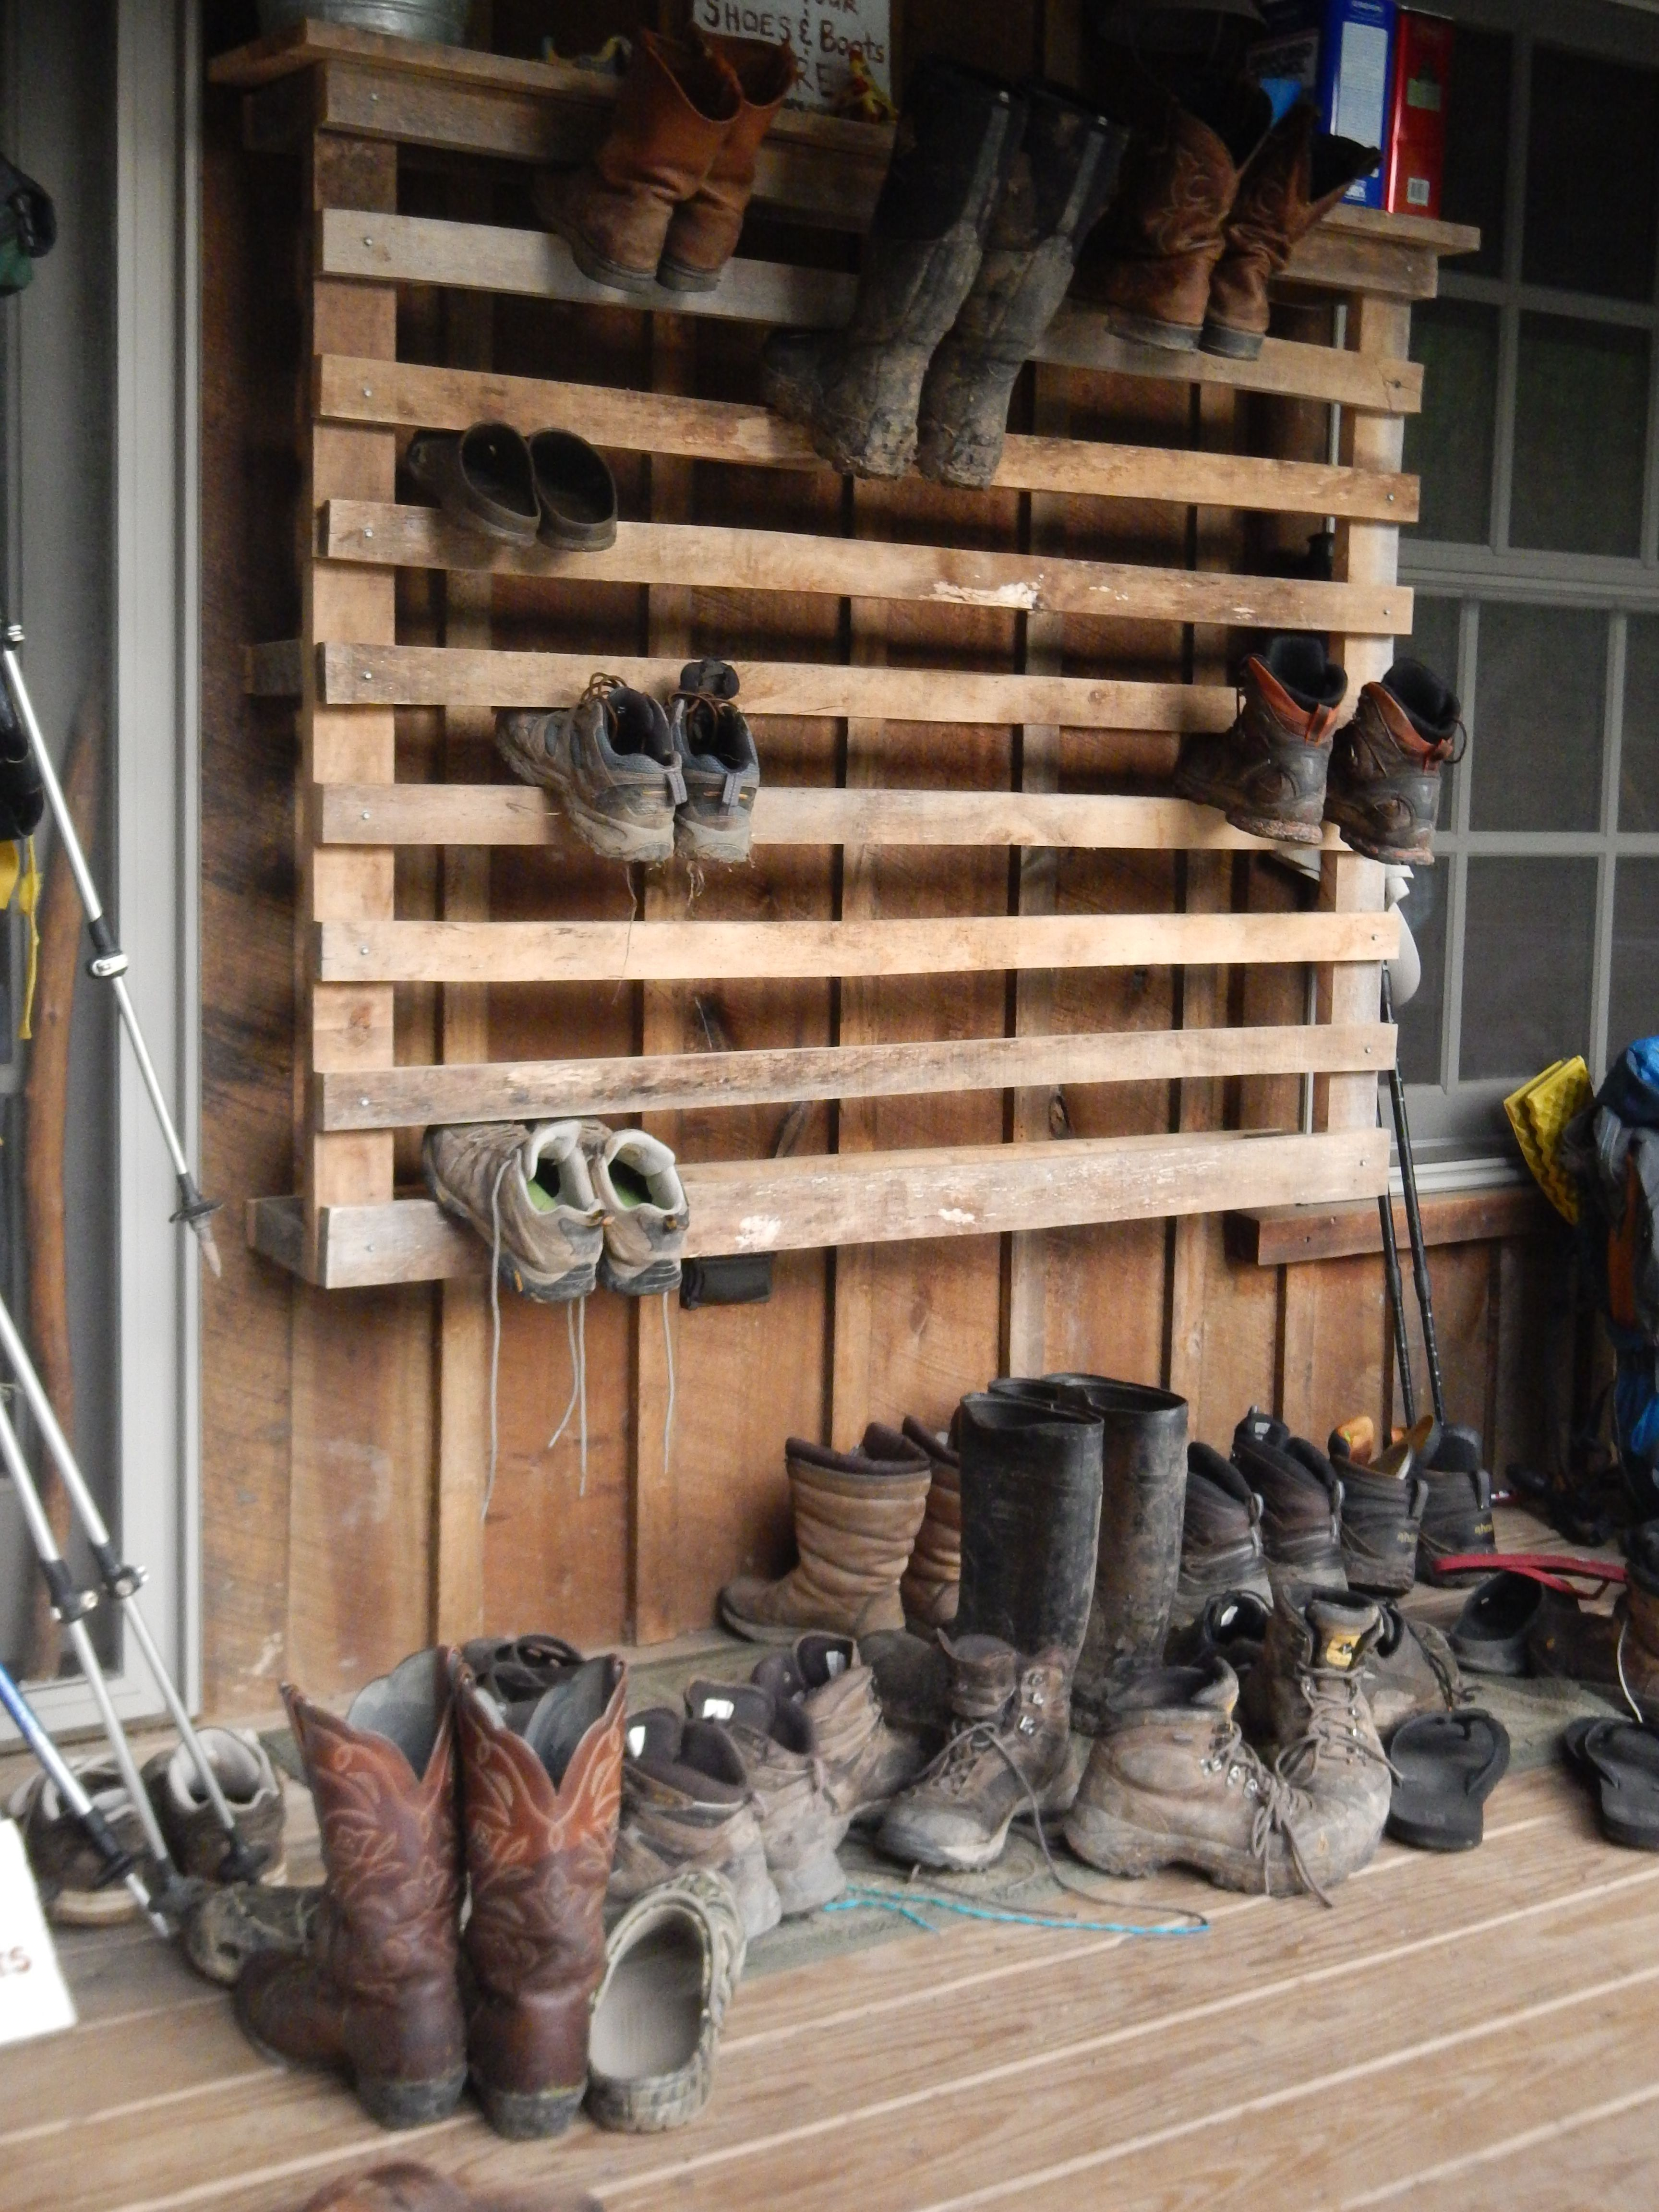 Wohnideen Interessantes Deko Day 10  Hiker footwear covers the porch at a hiker …